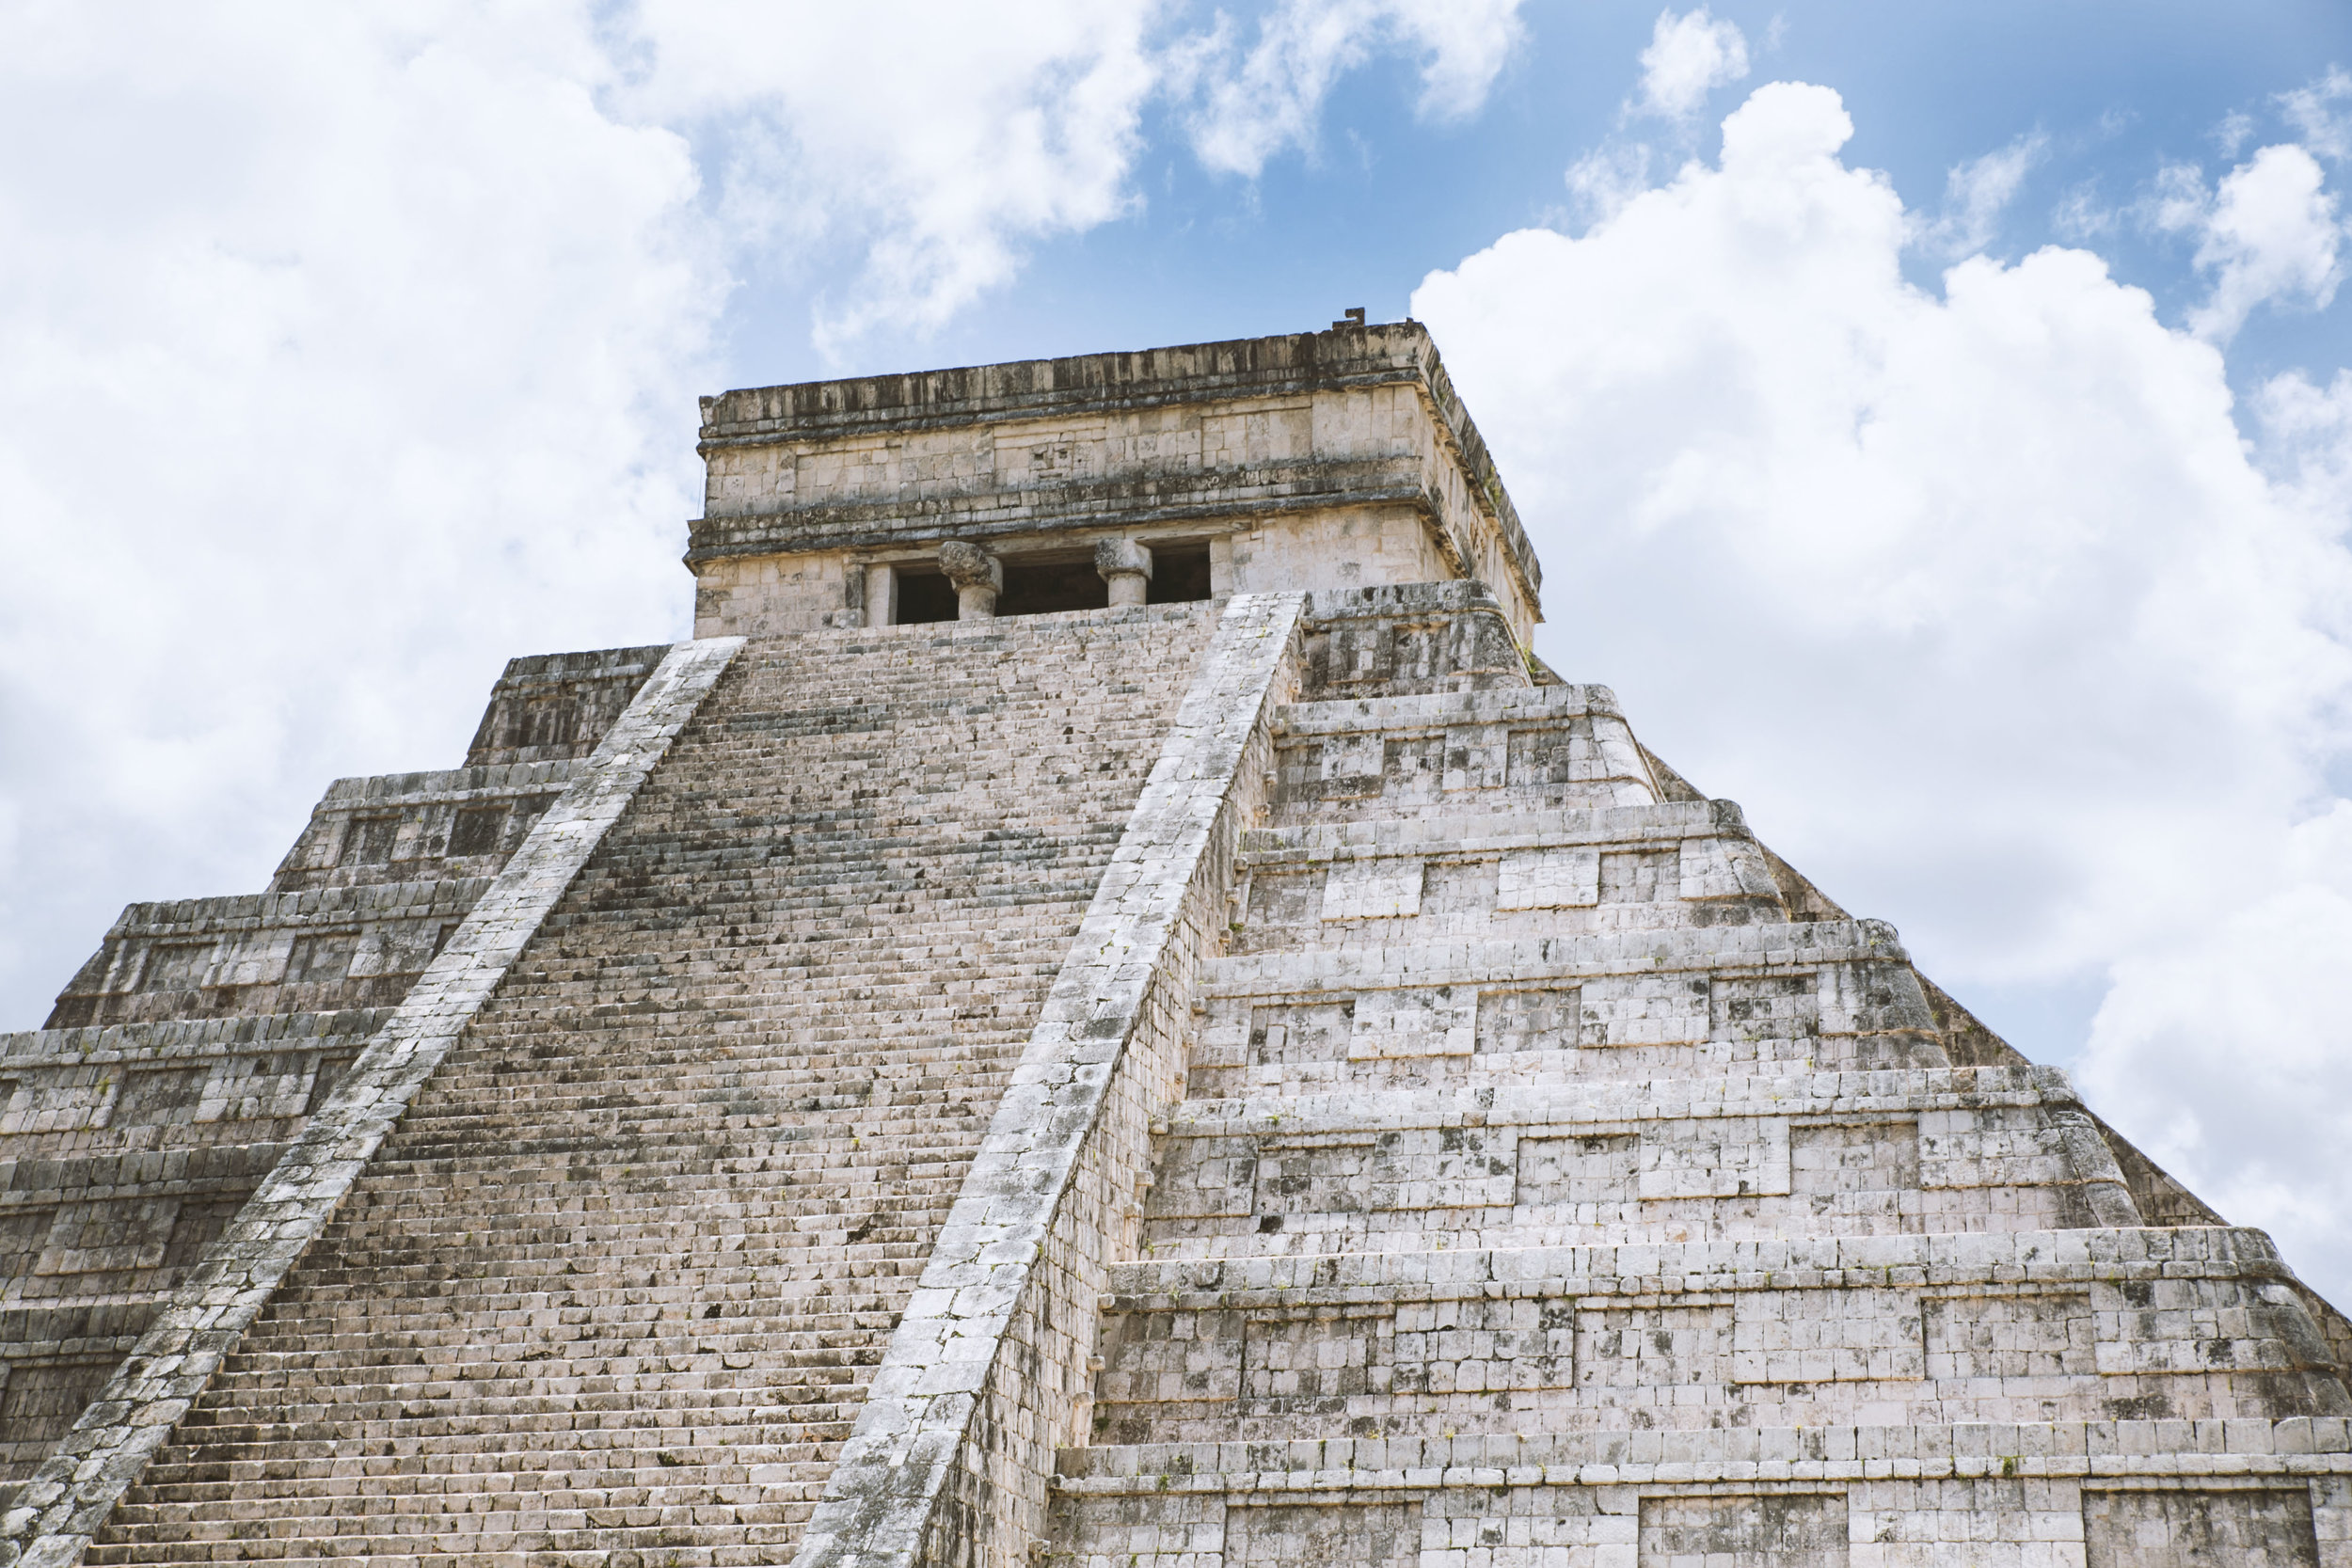 Chichen Itza Archeological Site, Yucatán.